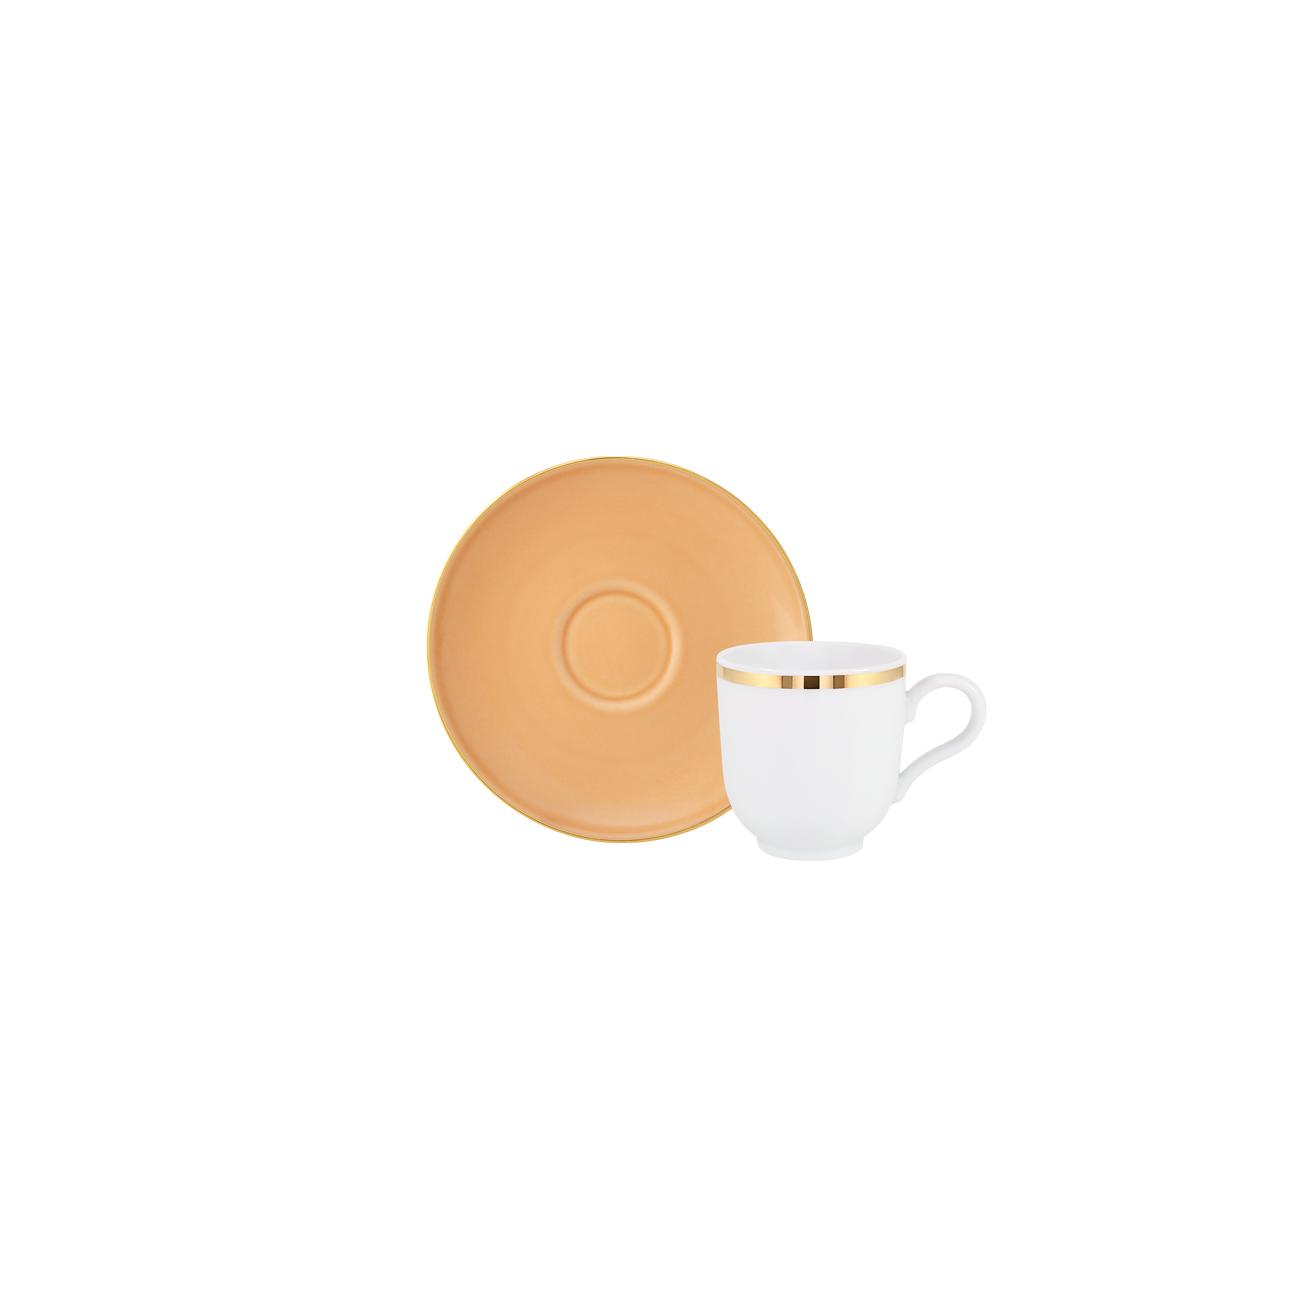 Chávena Café 10cl Antar + Pires Café 12cm Olympus 0